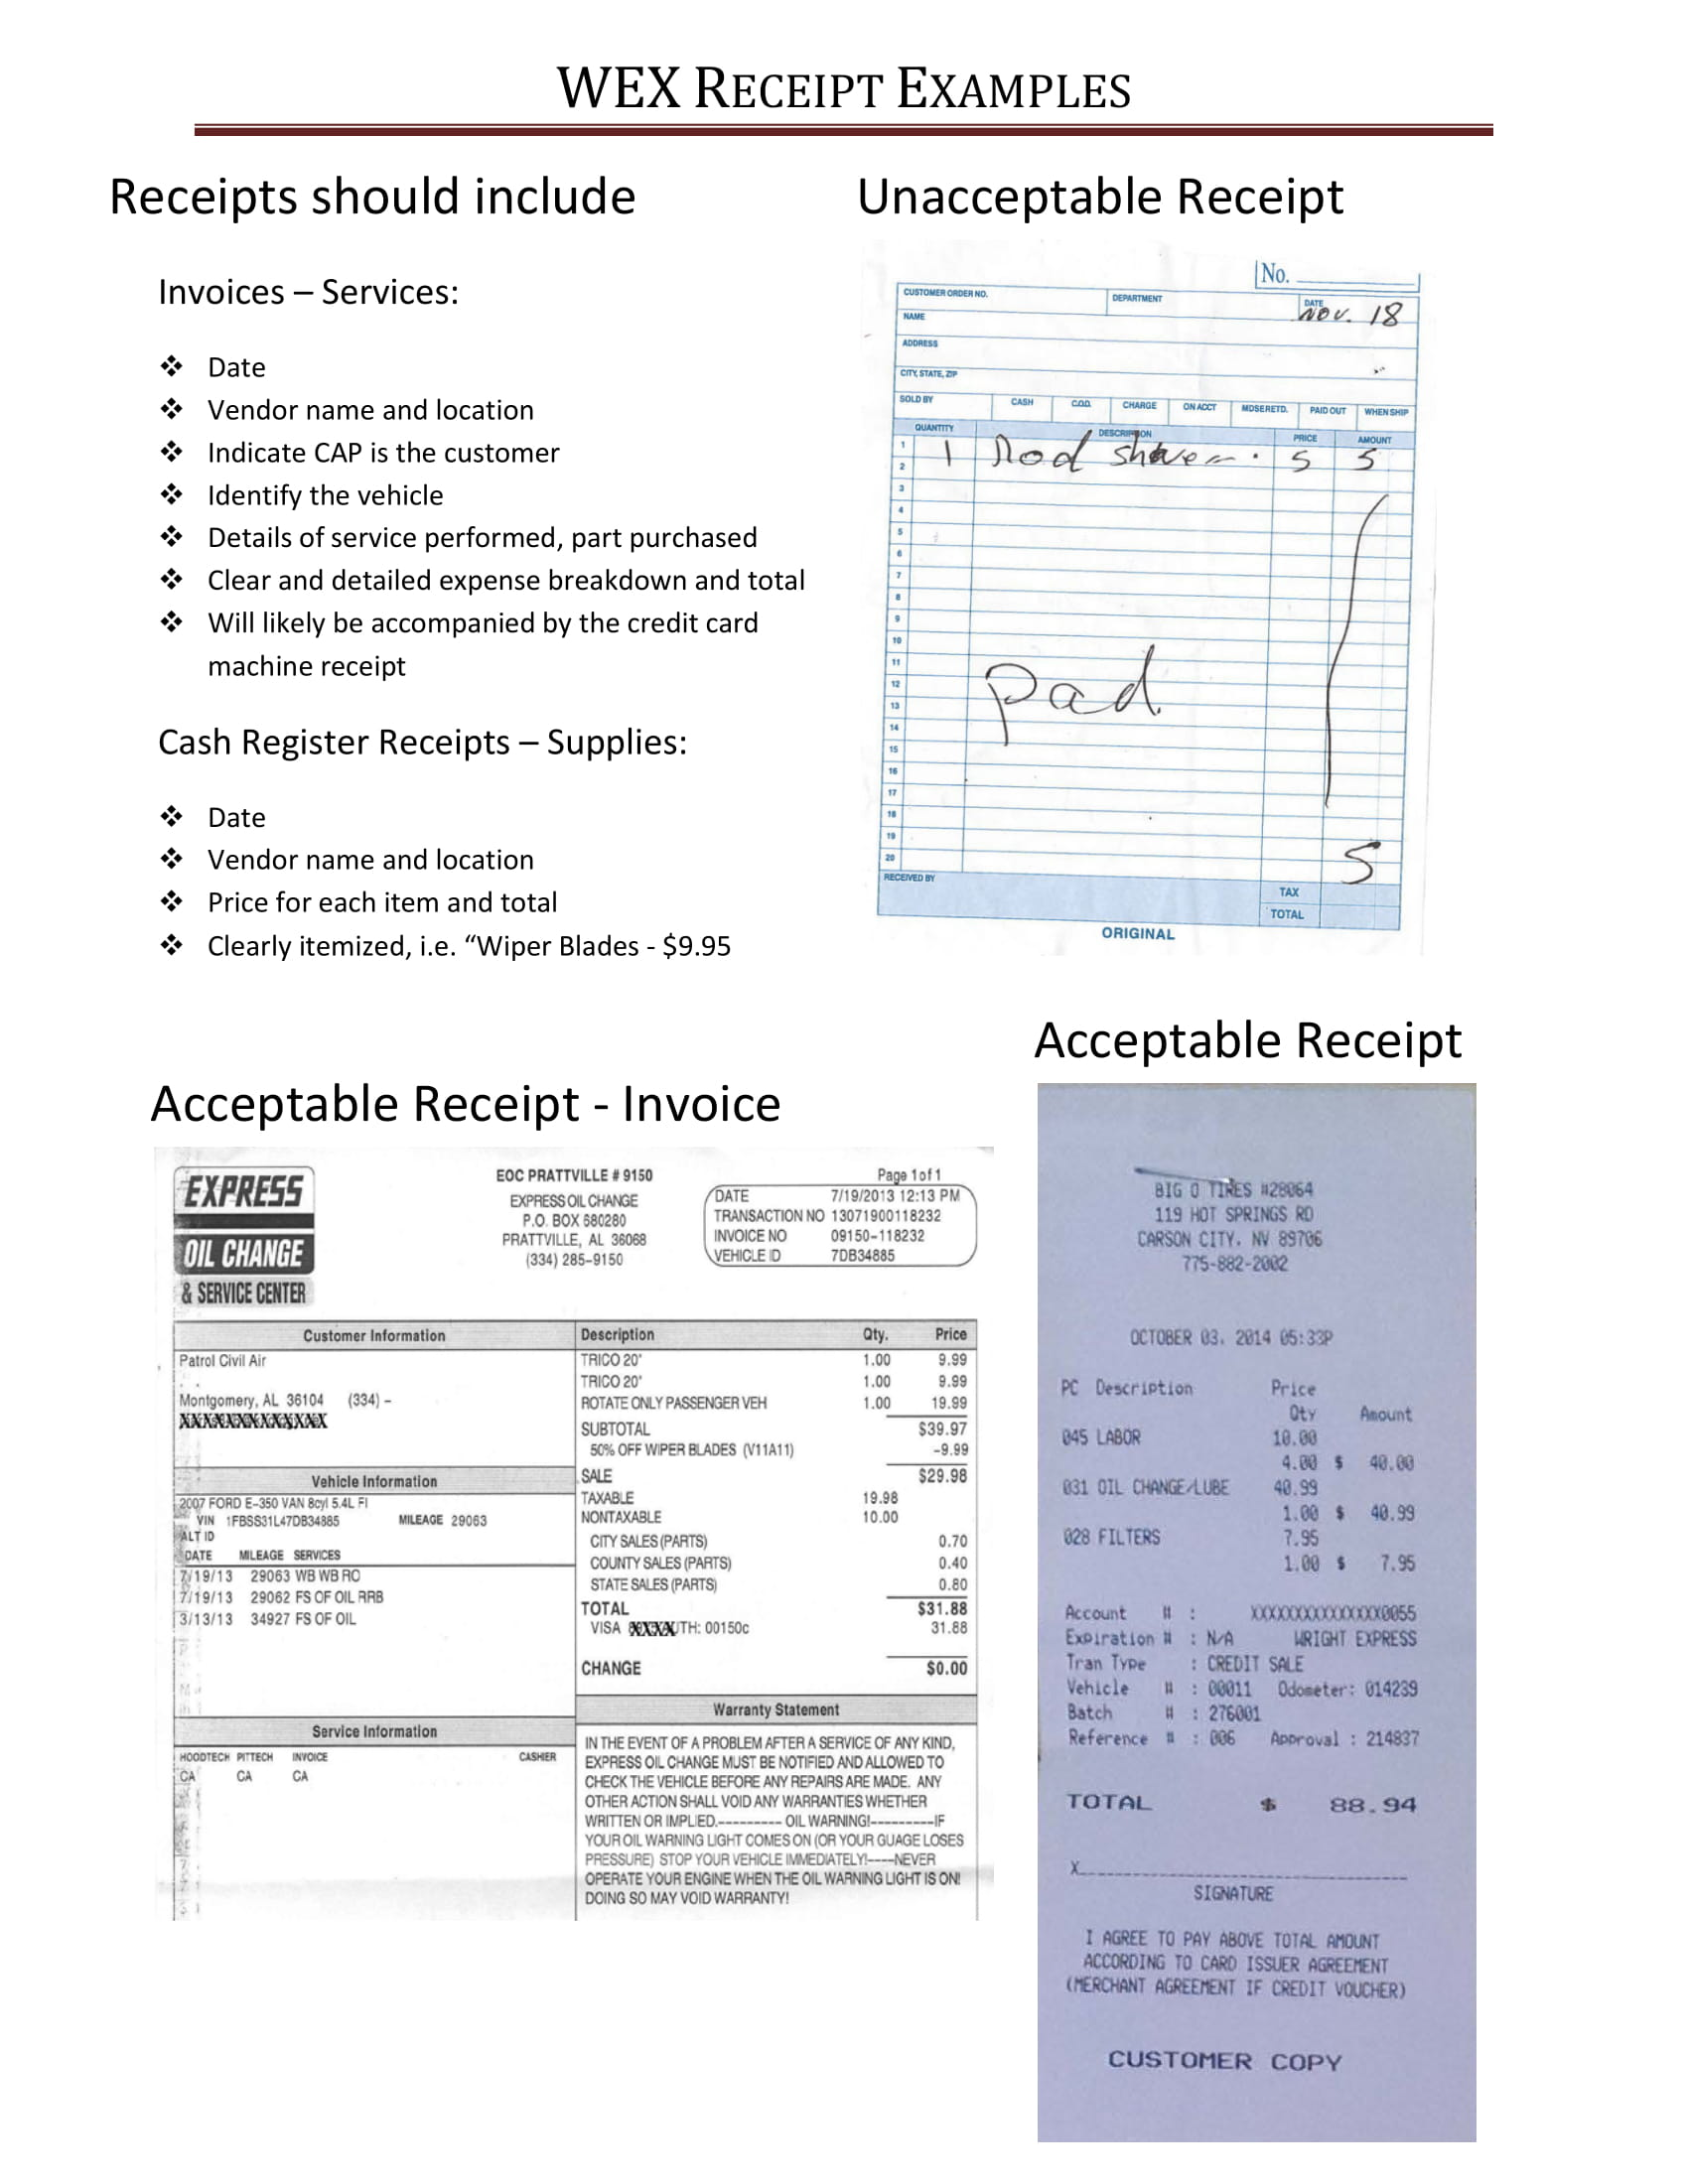 wex receipt examples